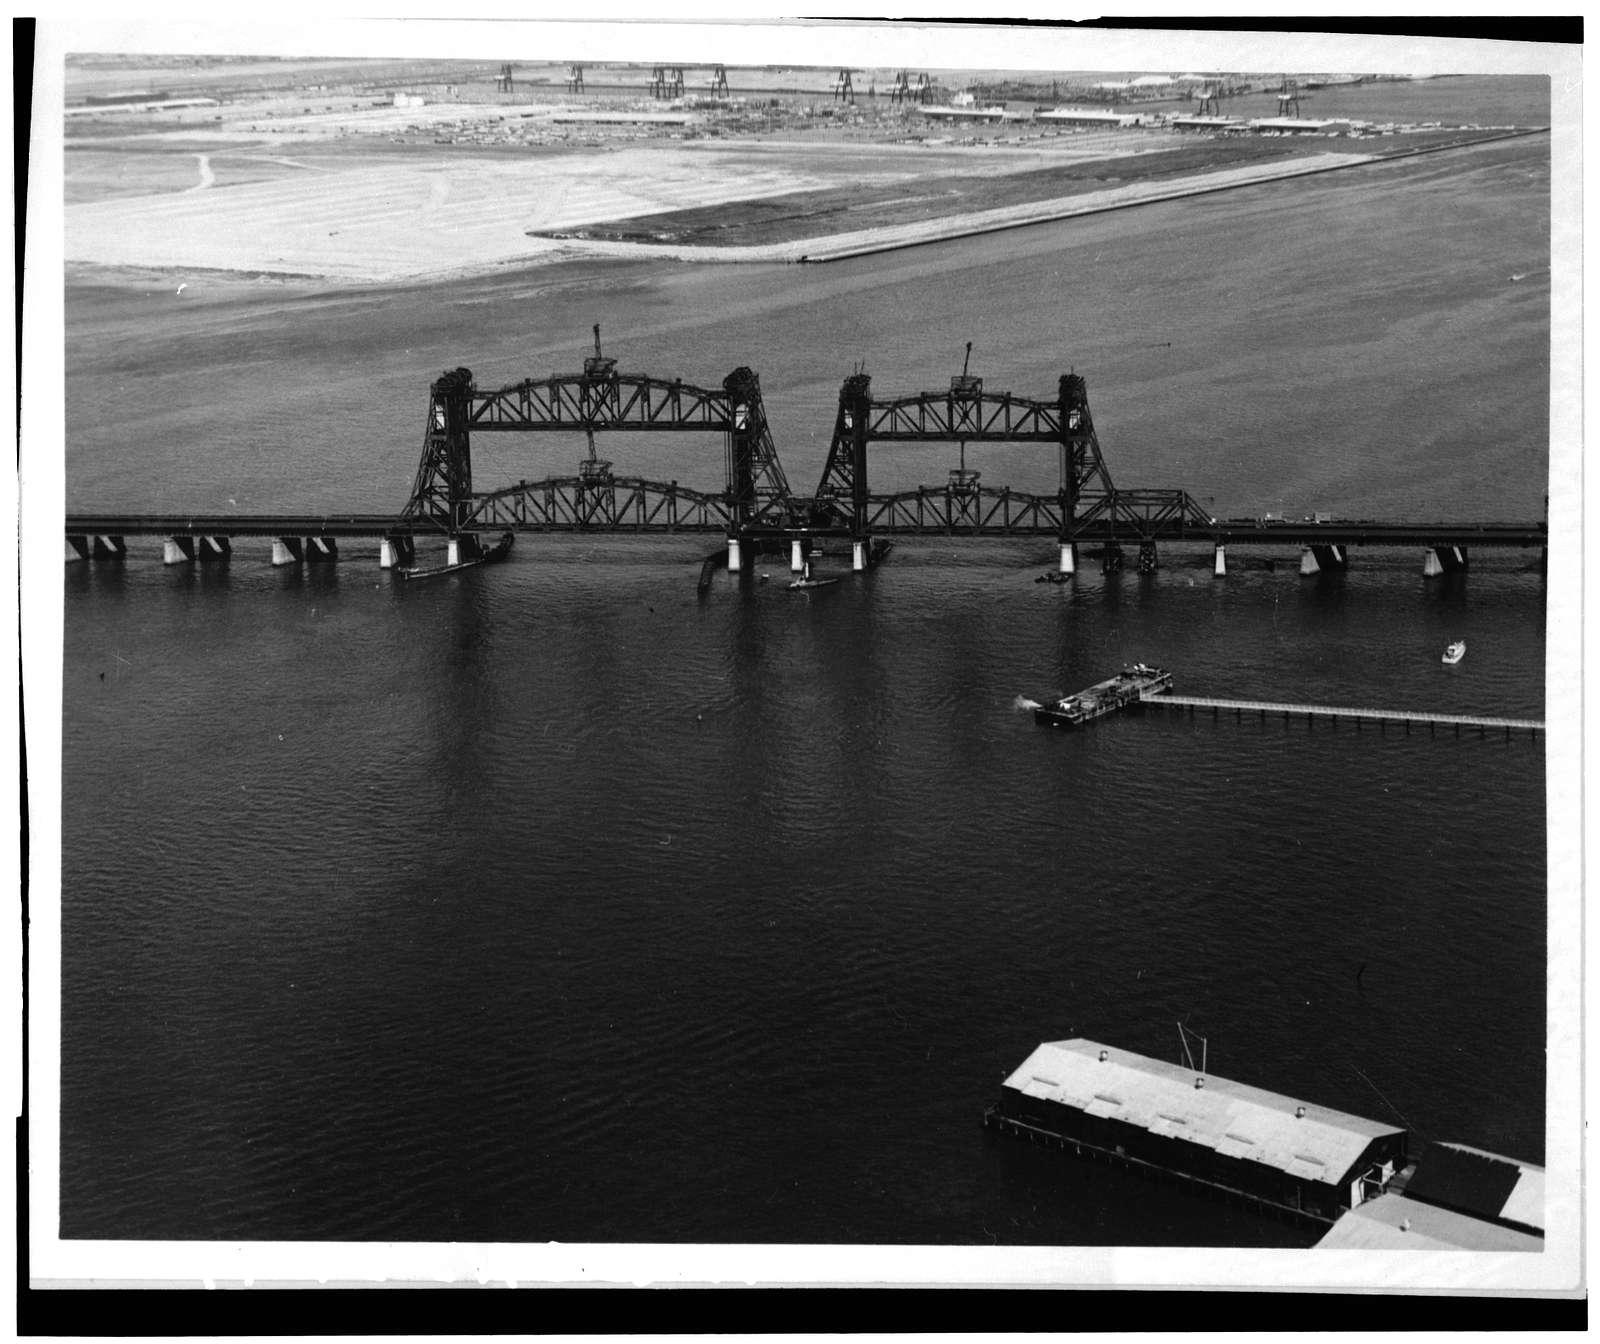 Central Railroad of New Jersey, Newark Bay Lift Bridge, Spanning Newark Bay, Newark, Essex County, NJ